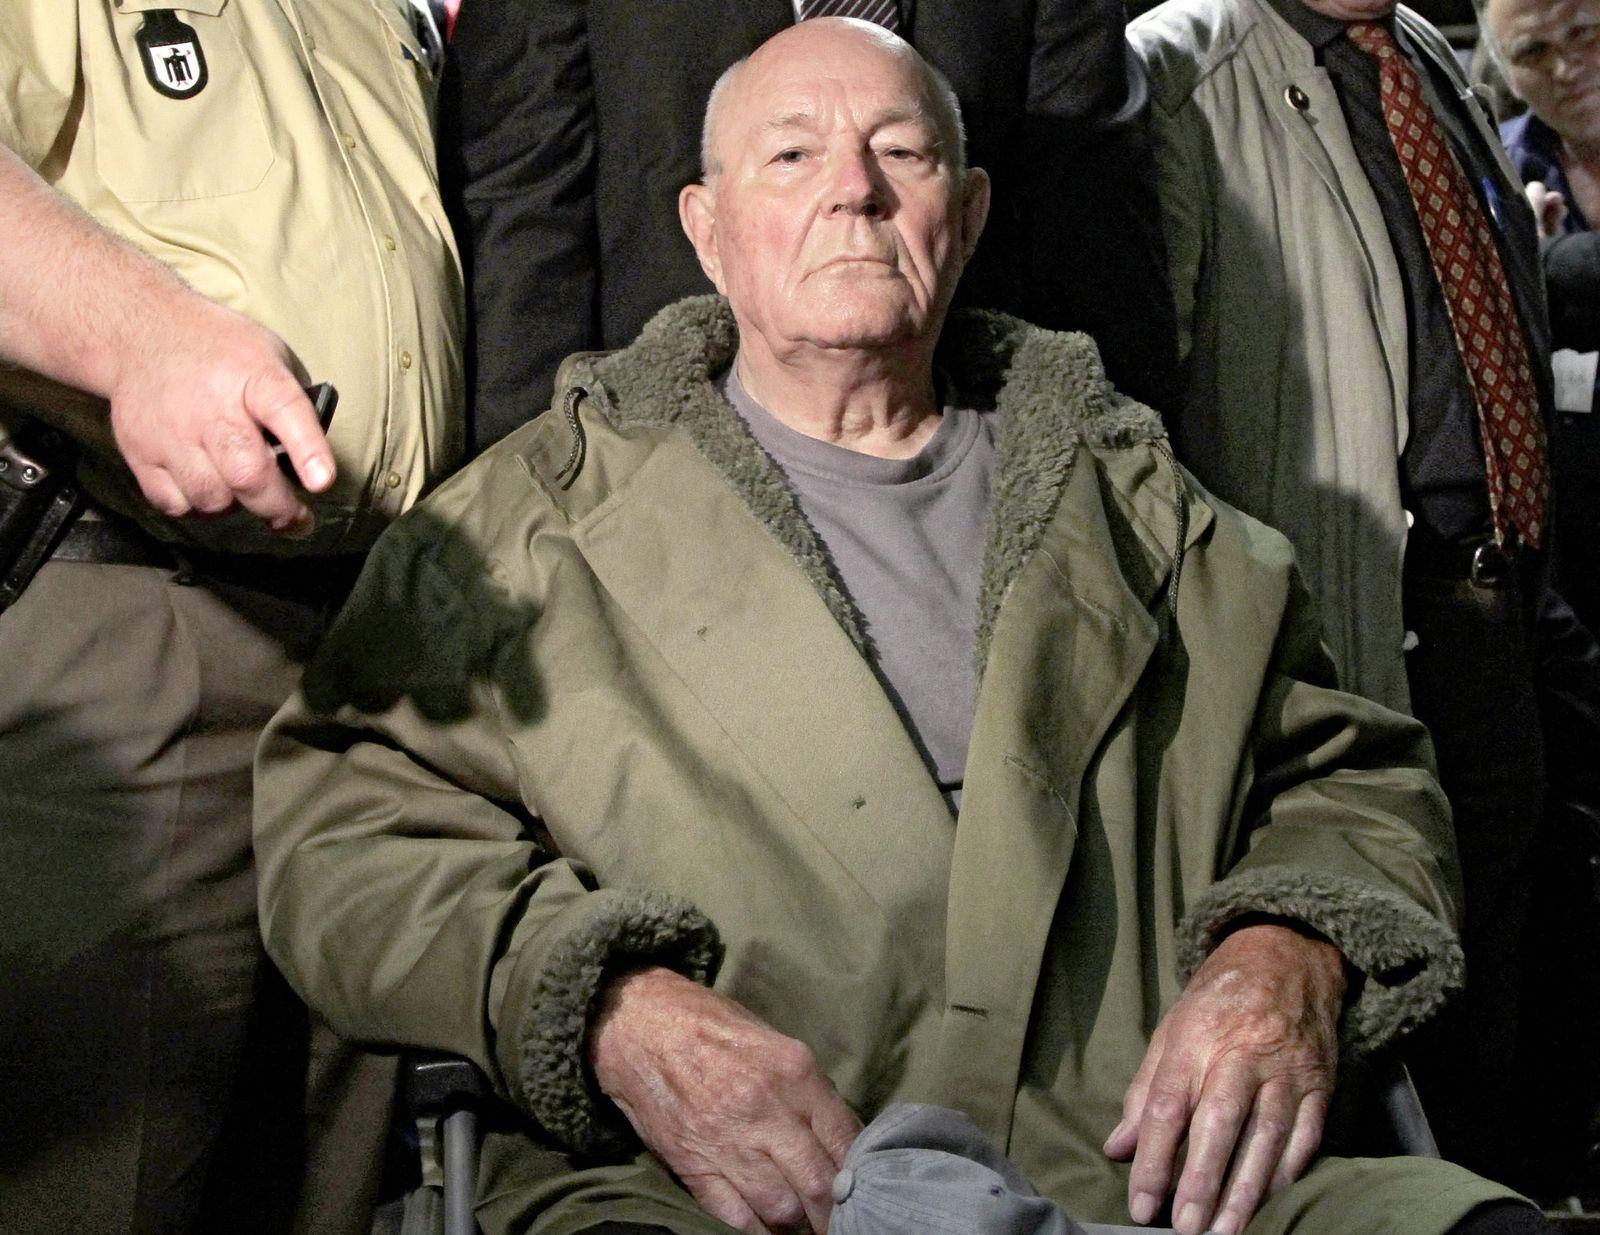 John Demjanjuk emerges from a Munich court